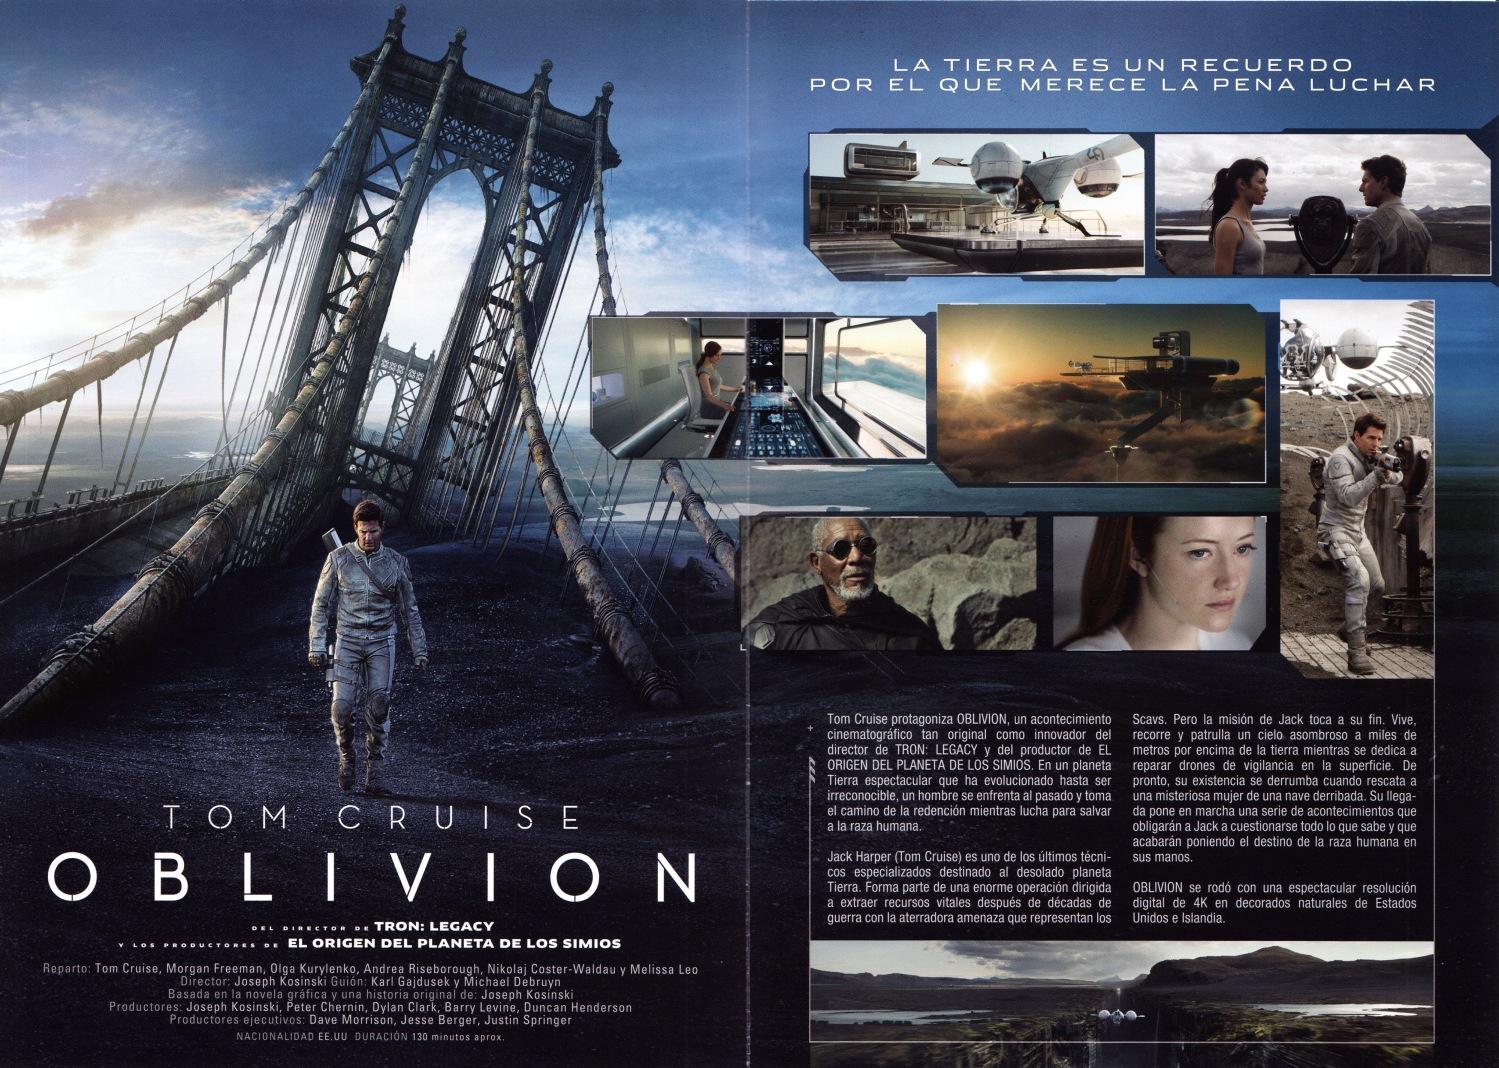 oblivion-pressbook-spain-2